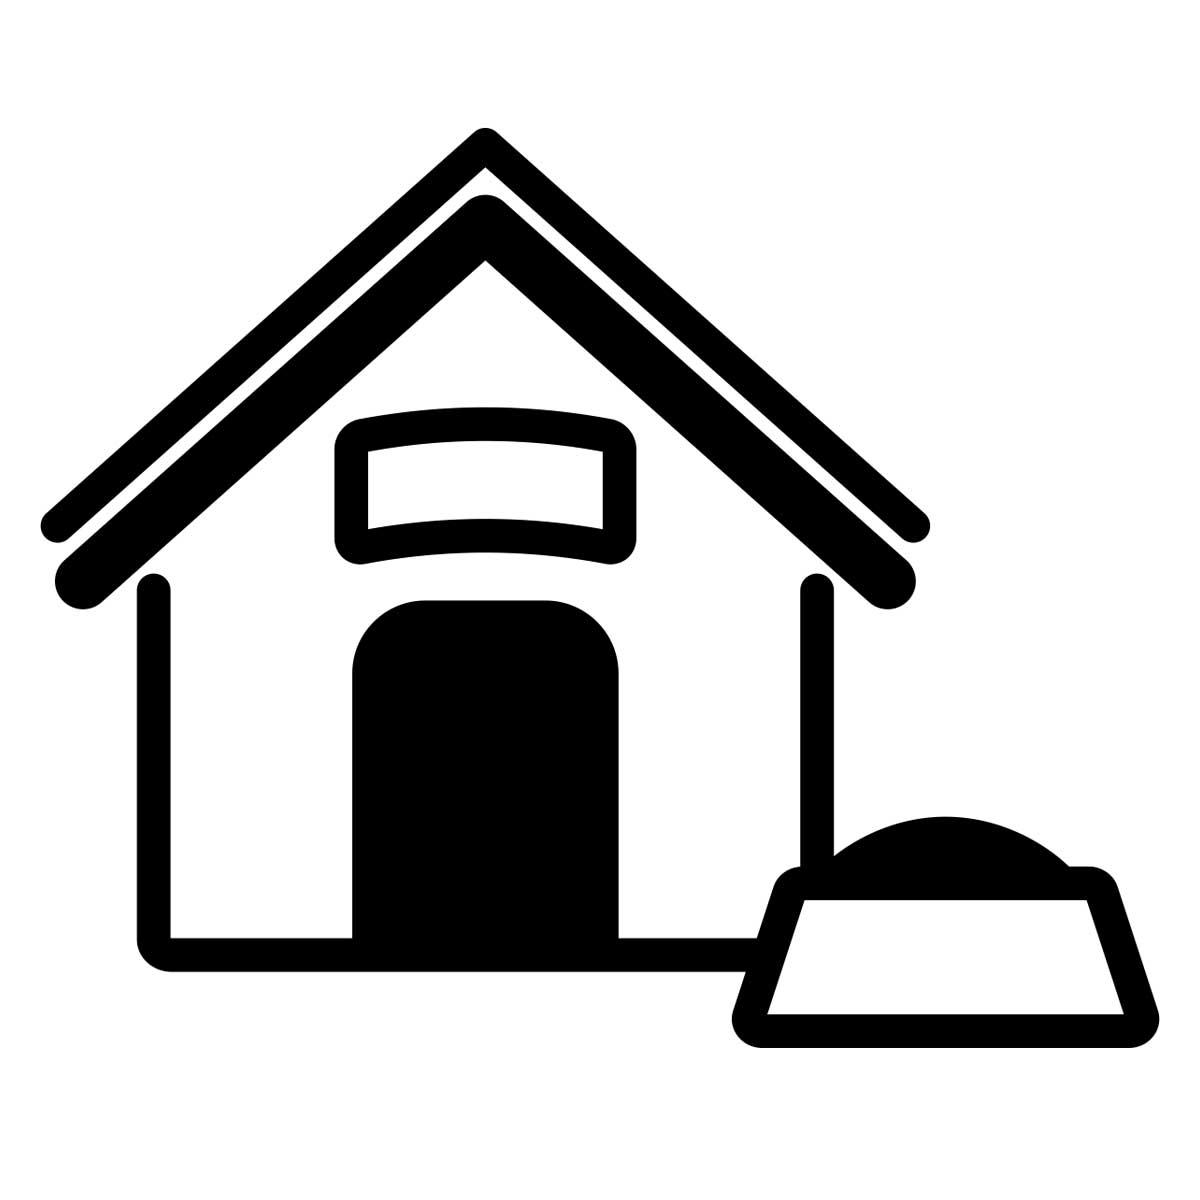 dog house beside a dog food bowl icon